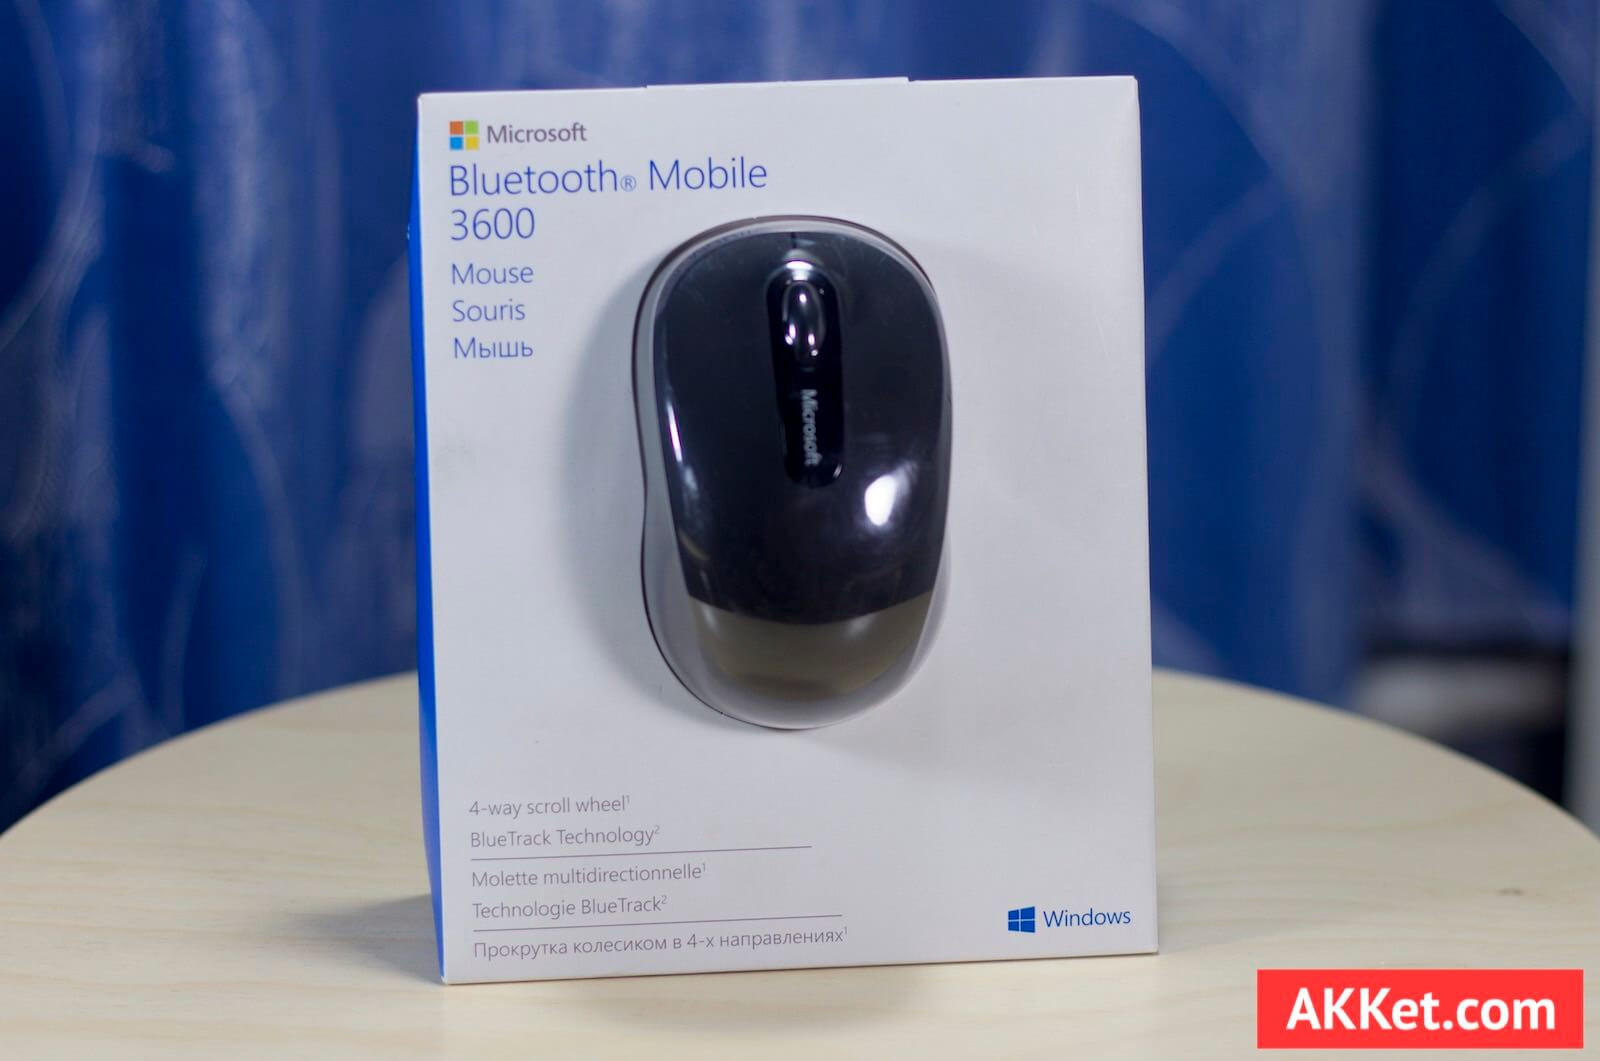 Обзор Bluetooth мыши Microsoft Mobile Mouse 3600 в связке с